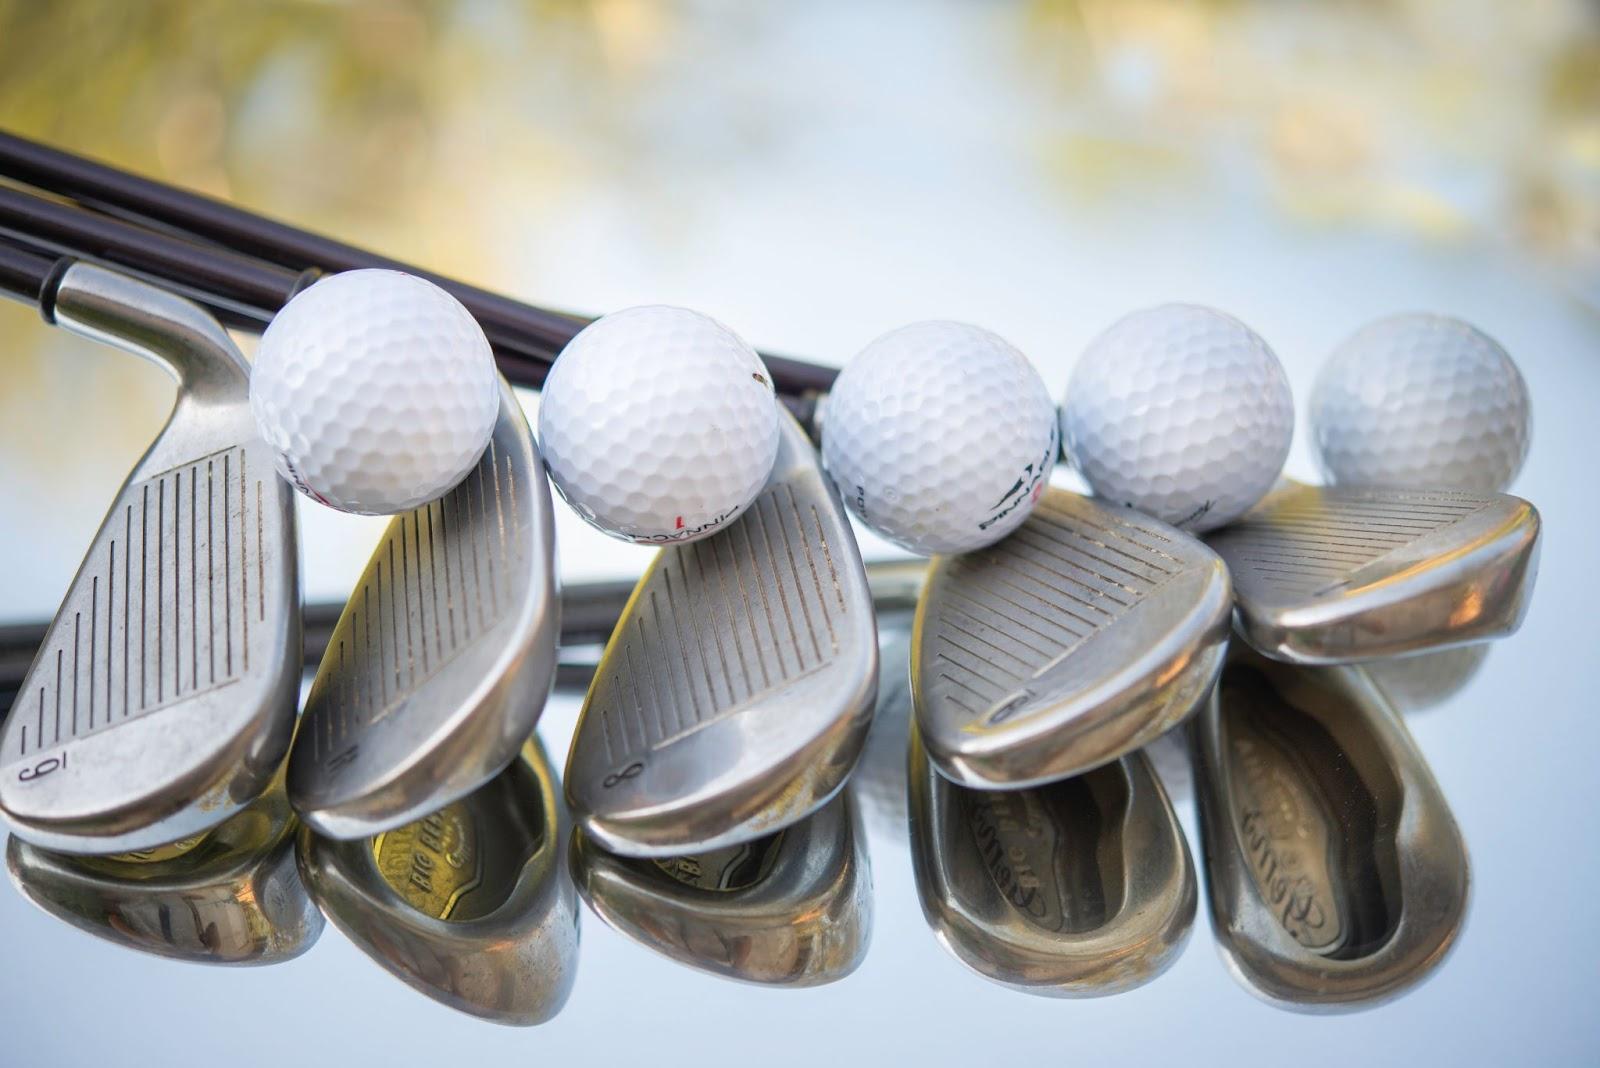 köpa golfklubbor Foto: Unsplash